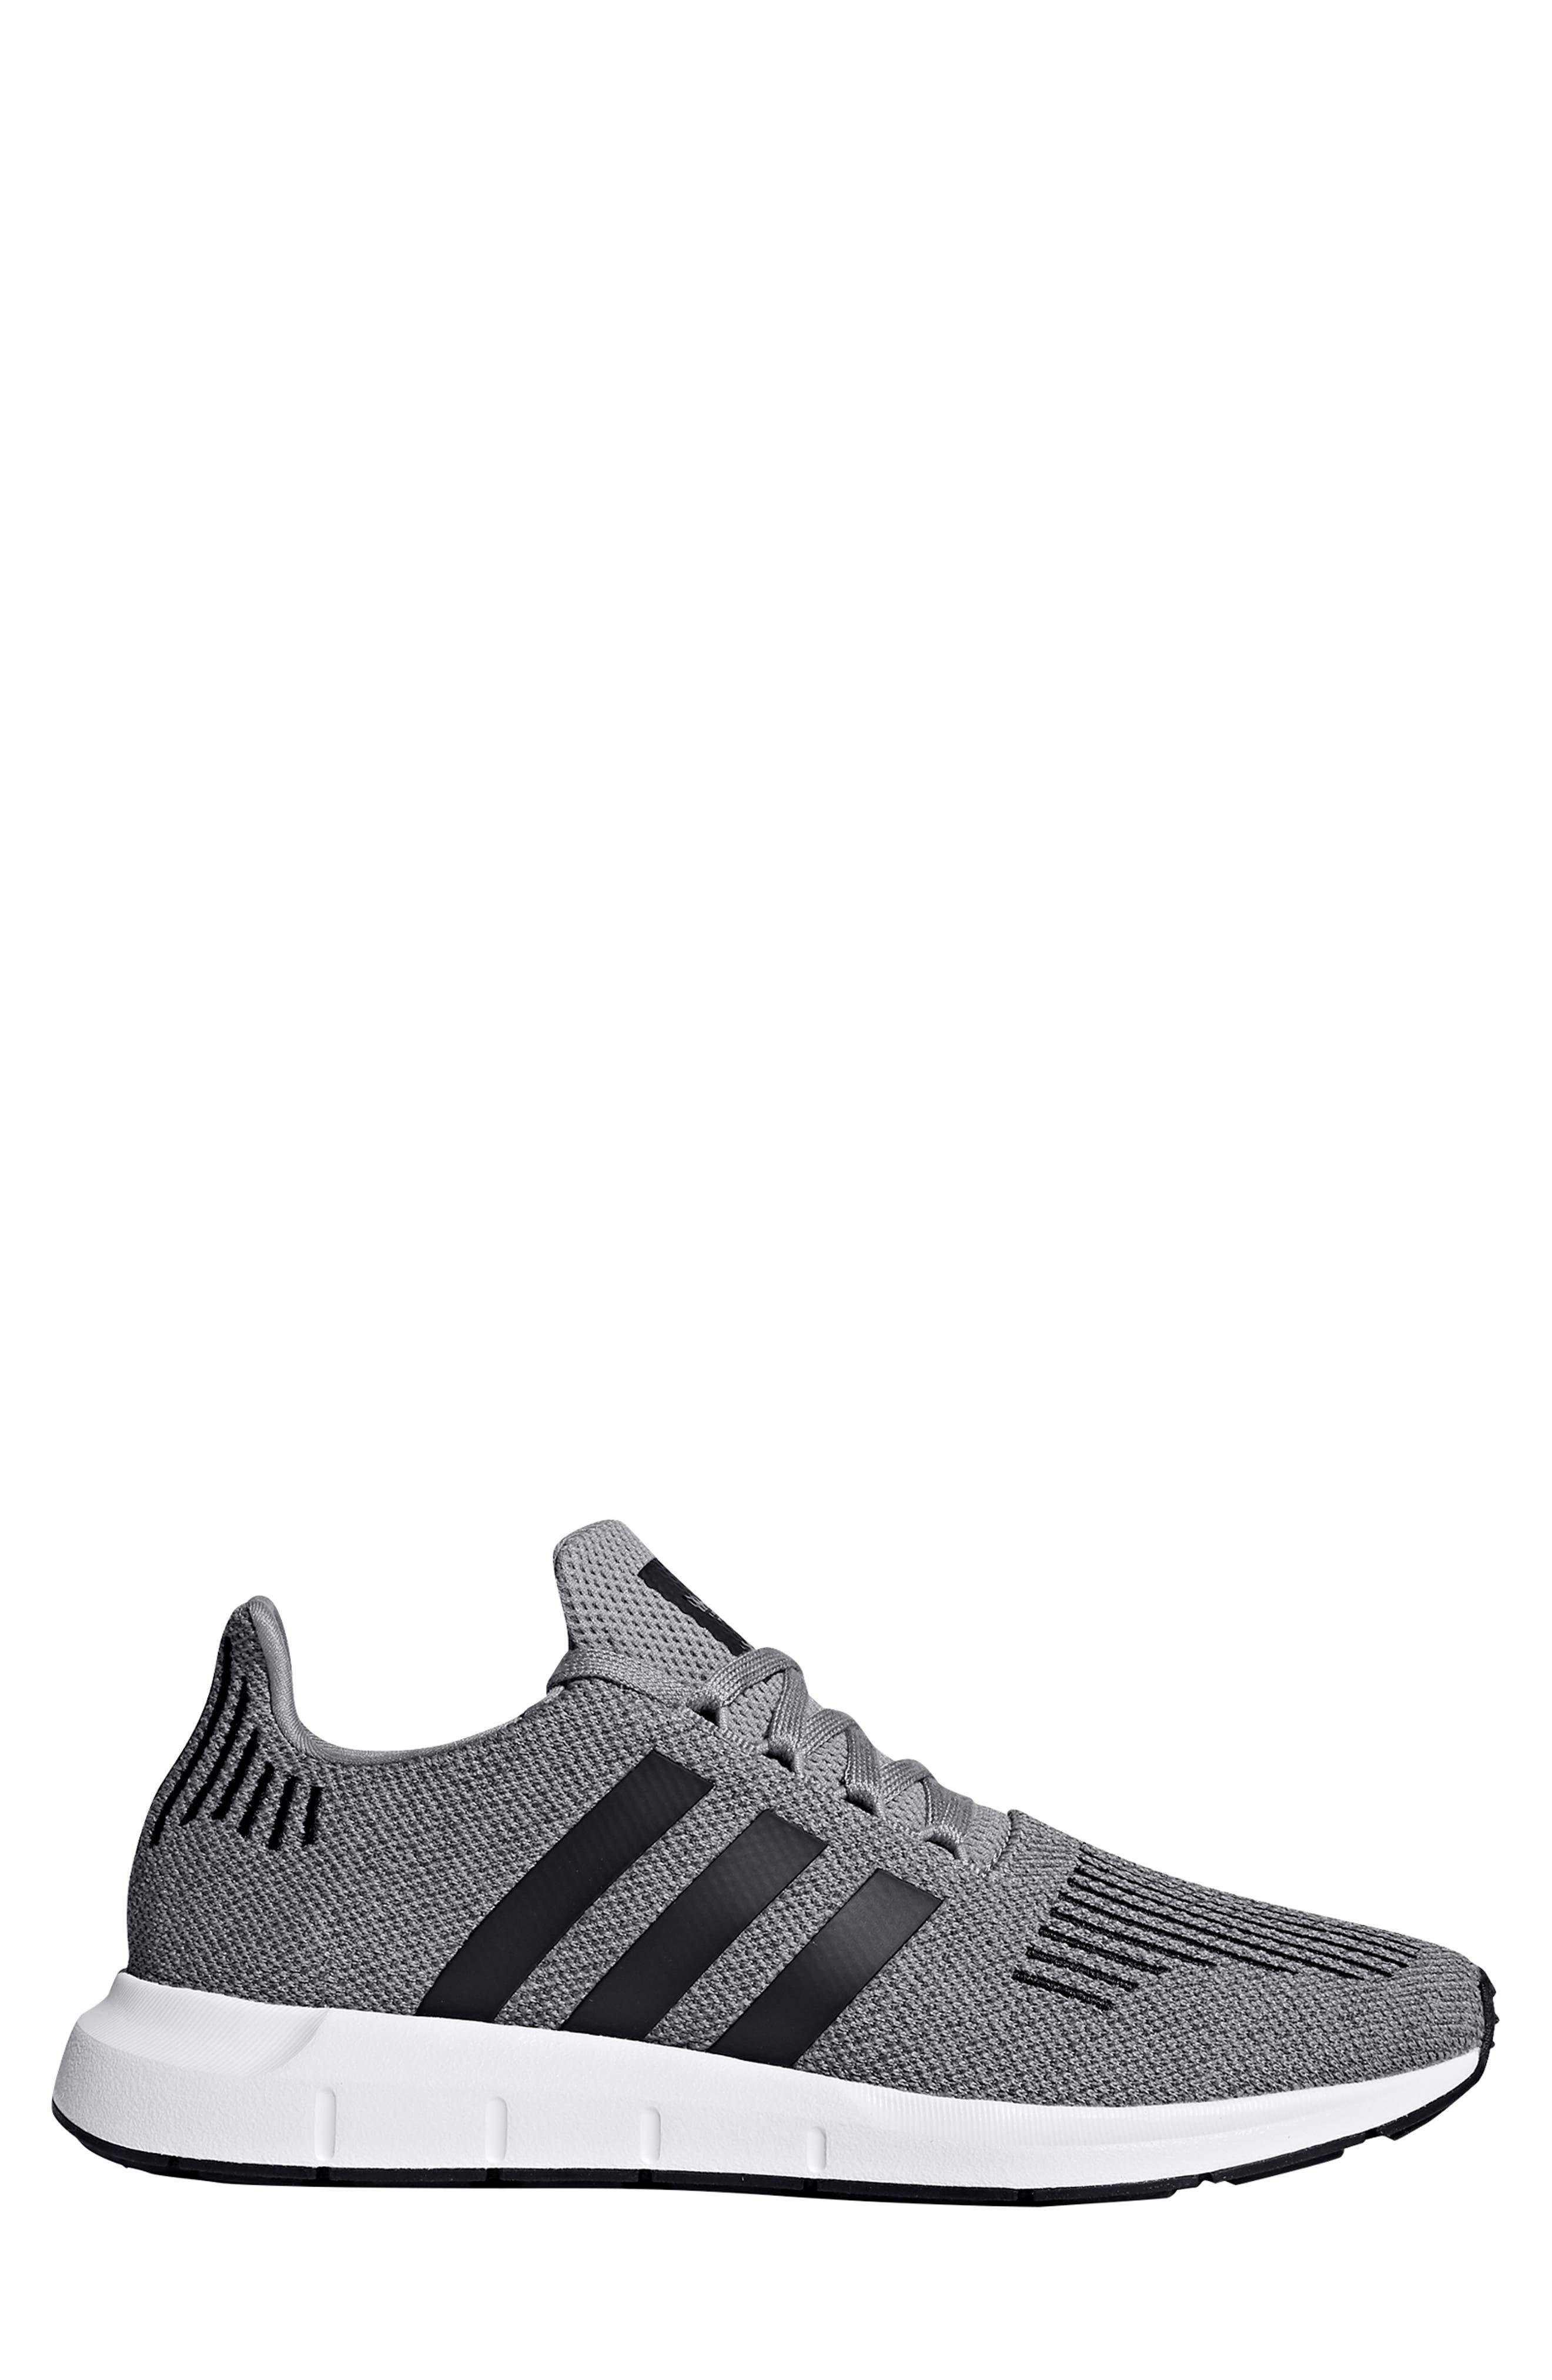 Swift Run Running Shoe,                         Main,                         color, Grey/ Black/ Medium Grey